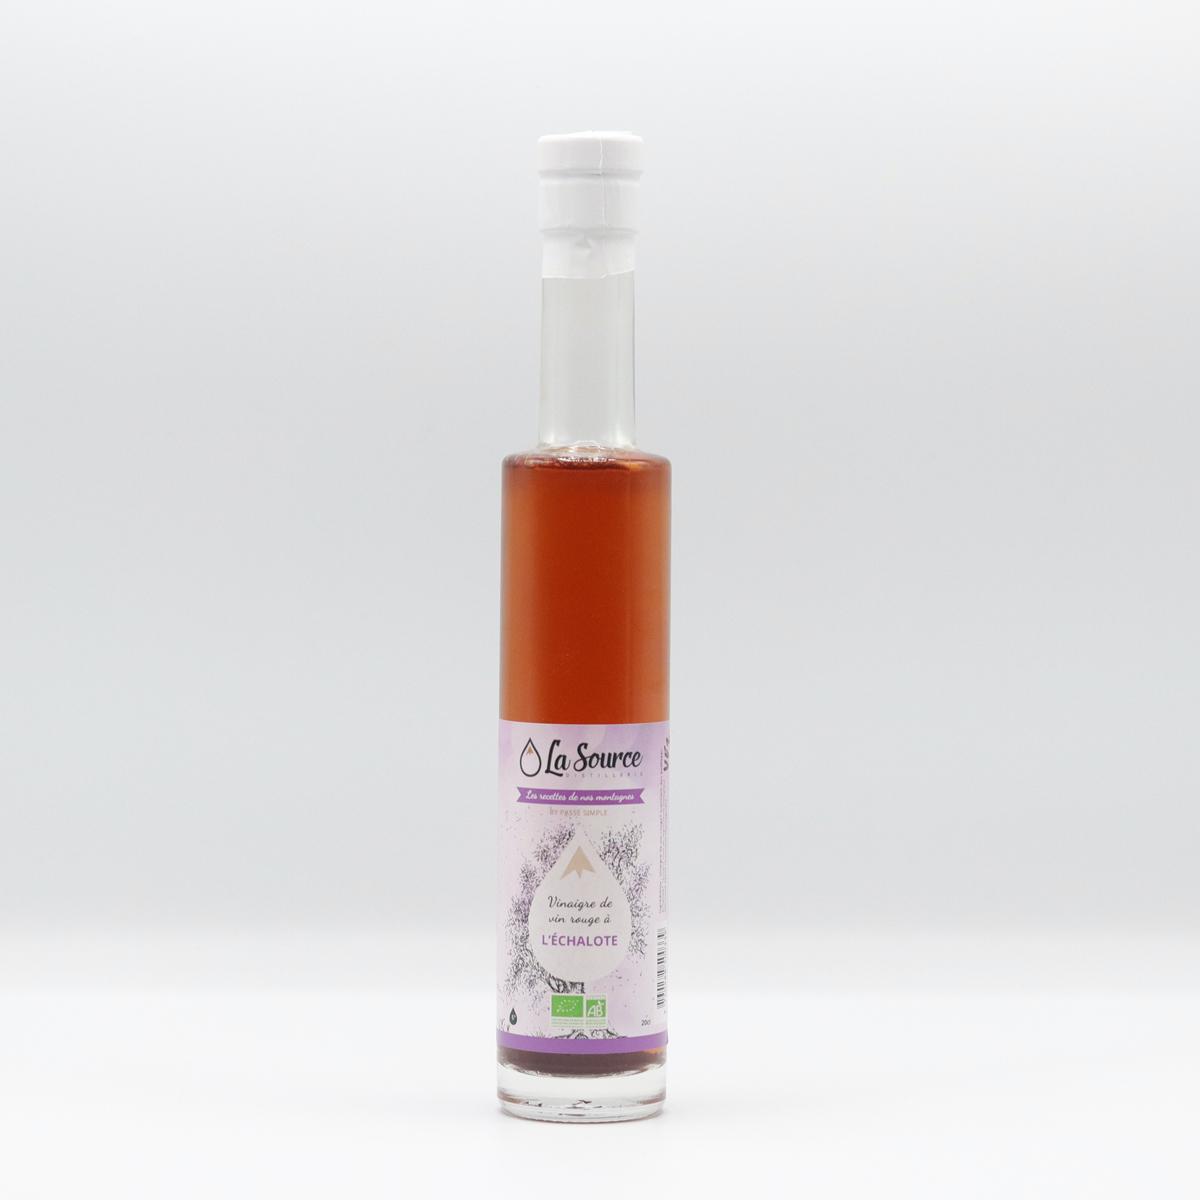 https://www.lasource-distillerie.fr/wp-content/uploads/2020/04/vinaigre-echalote.jpg